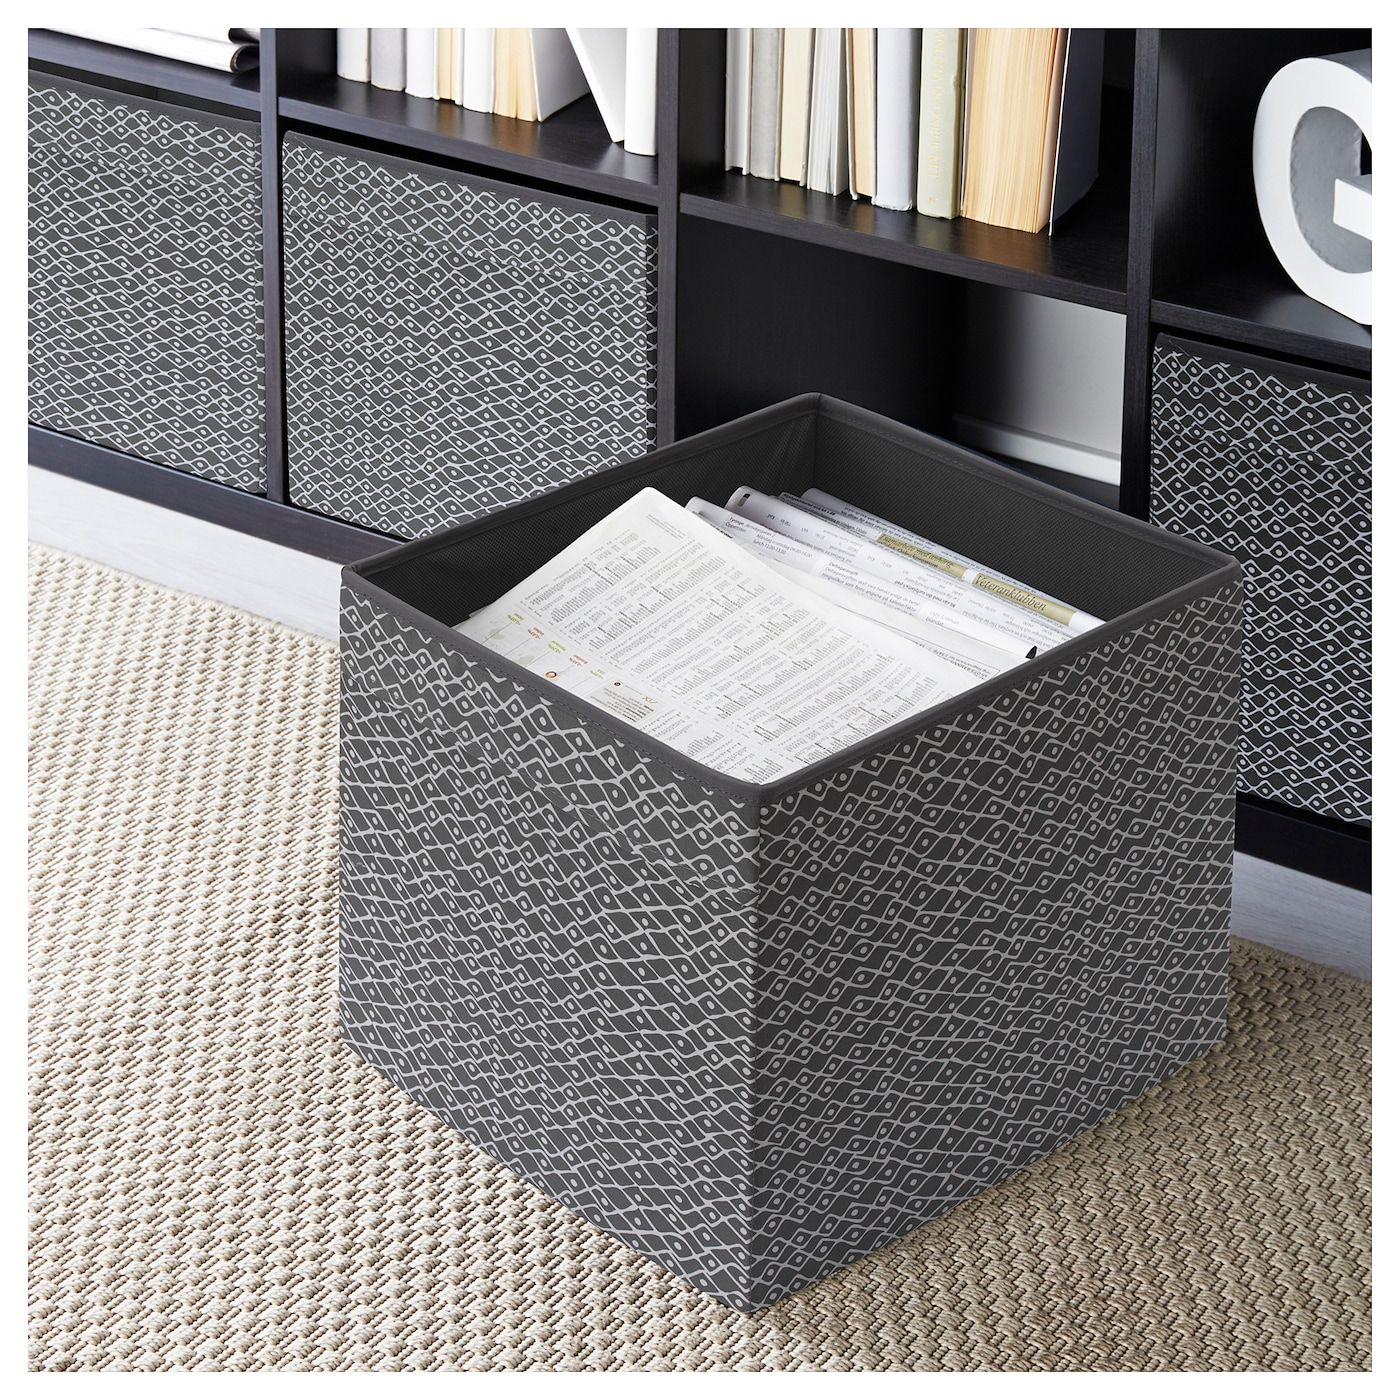 Drona Box Grey White Patterned Ikea Ikea Storage Boxes Kallax Shelving Unit White Storage [ 1400 x 1400 Pixel ]